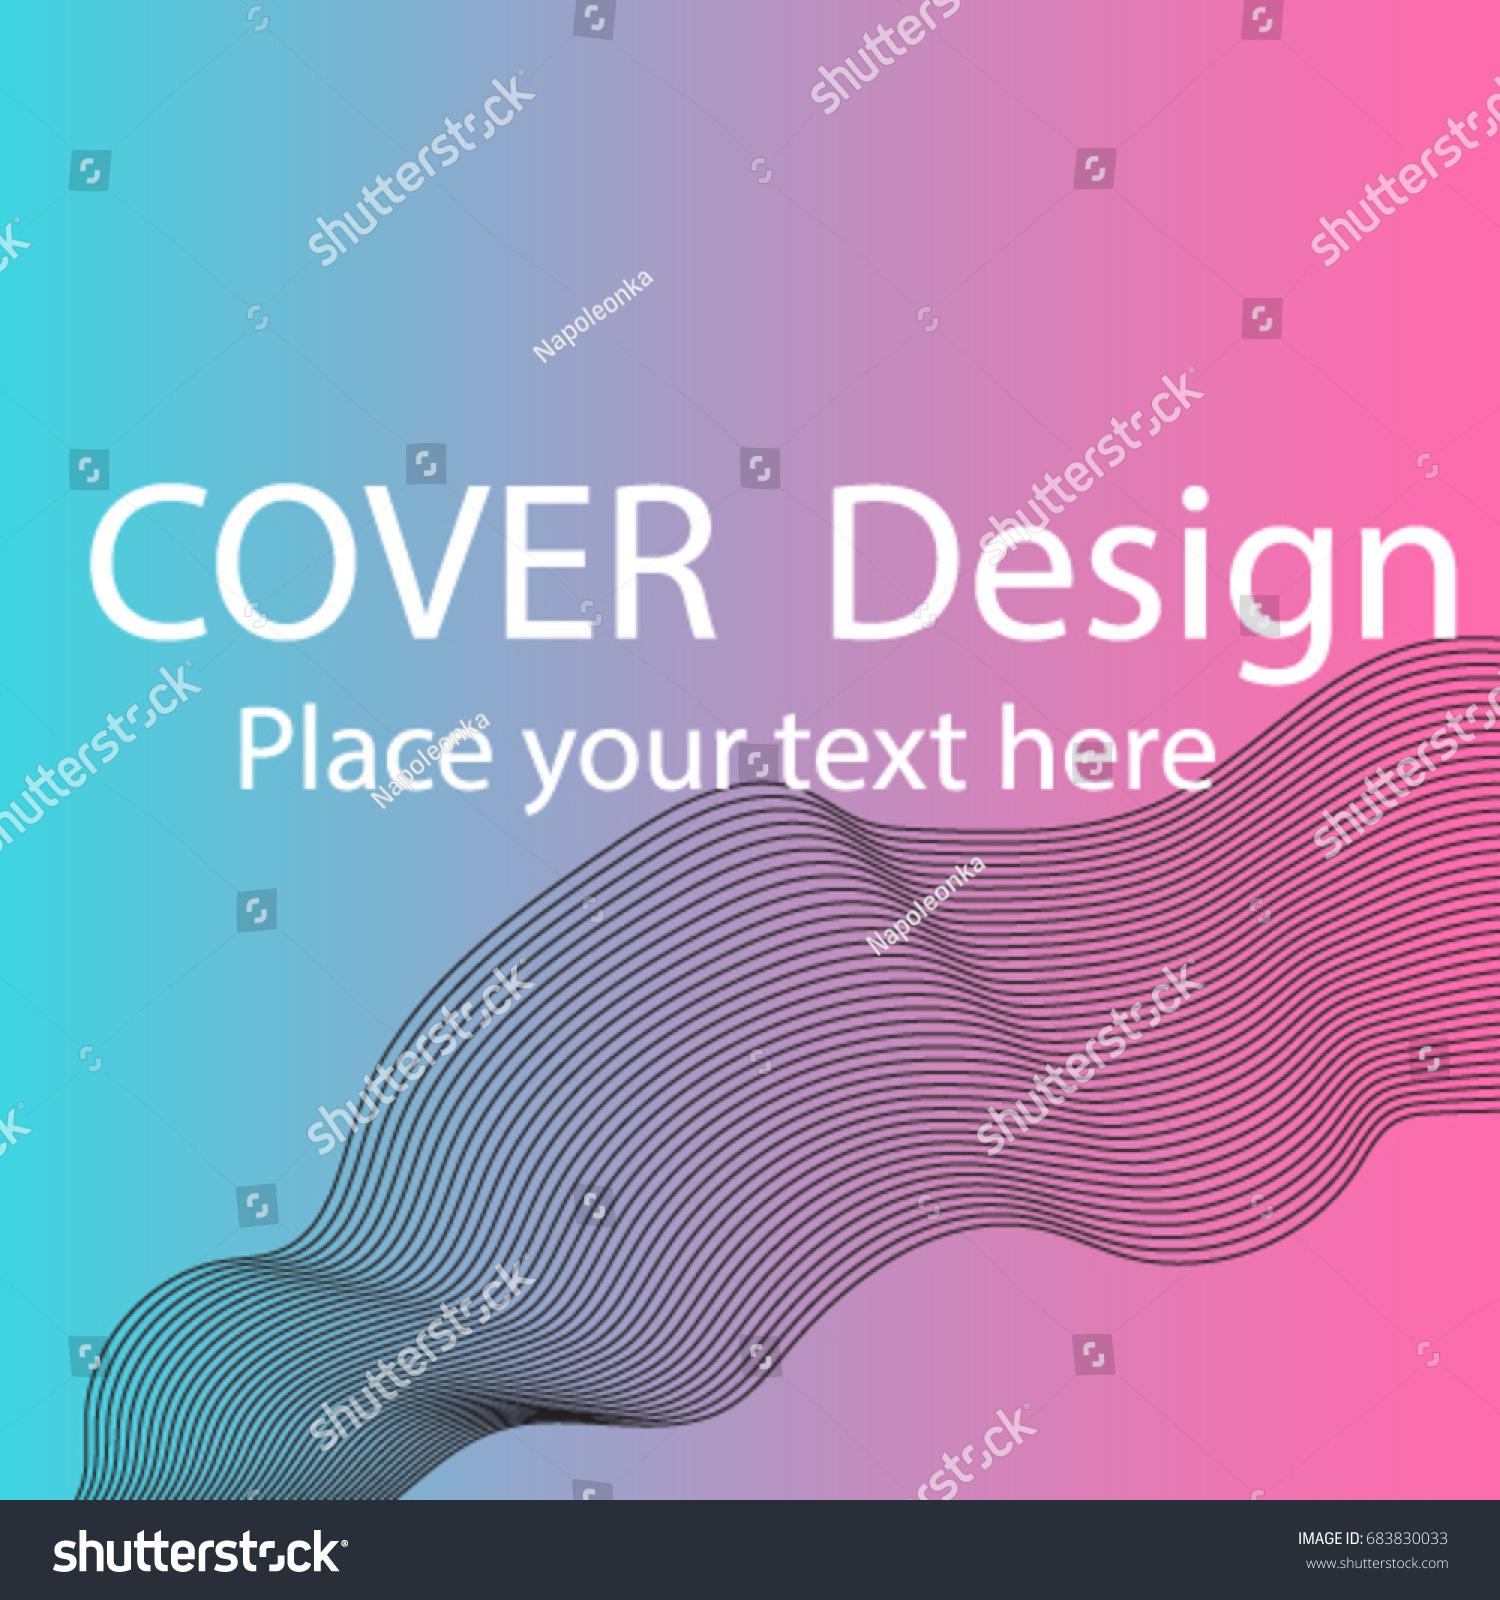 Design banner minimalist - Duo Tone Cover Design Geometry Halftone Banner Minimalist